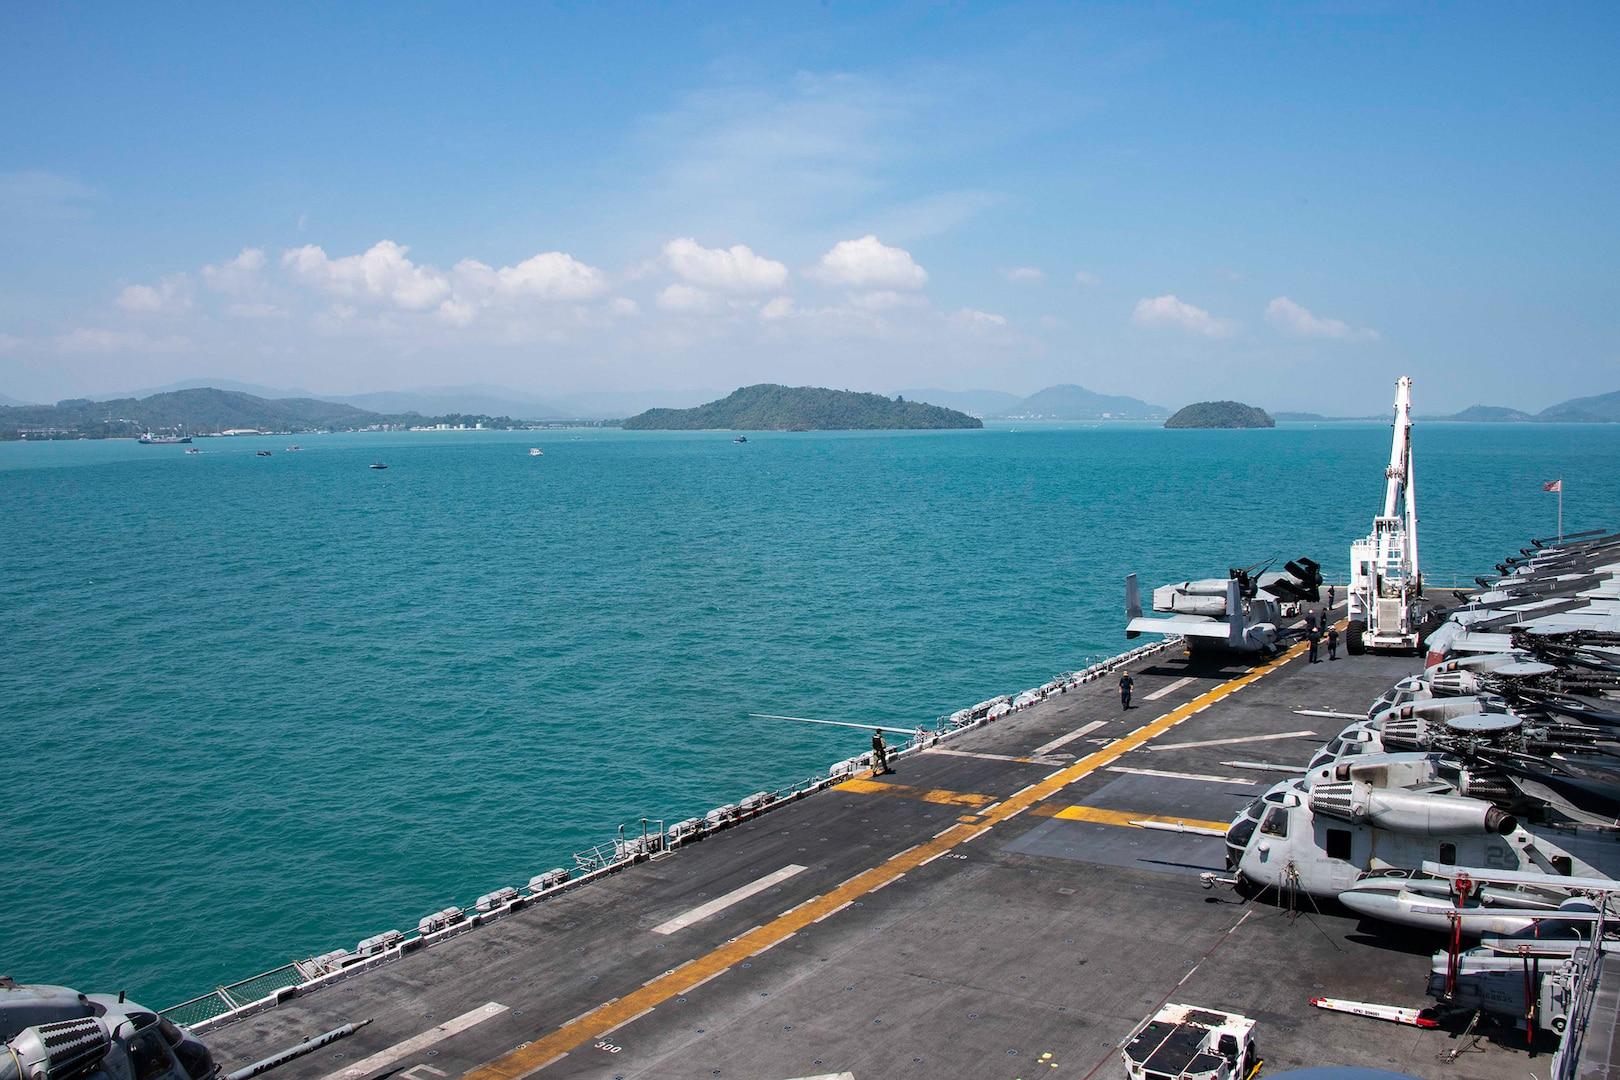 Essex Arrives in Phuket